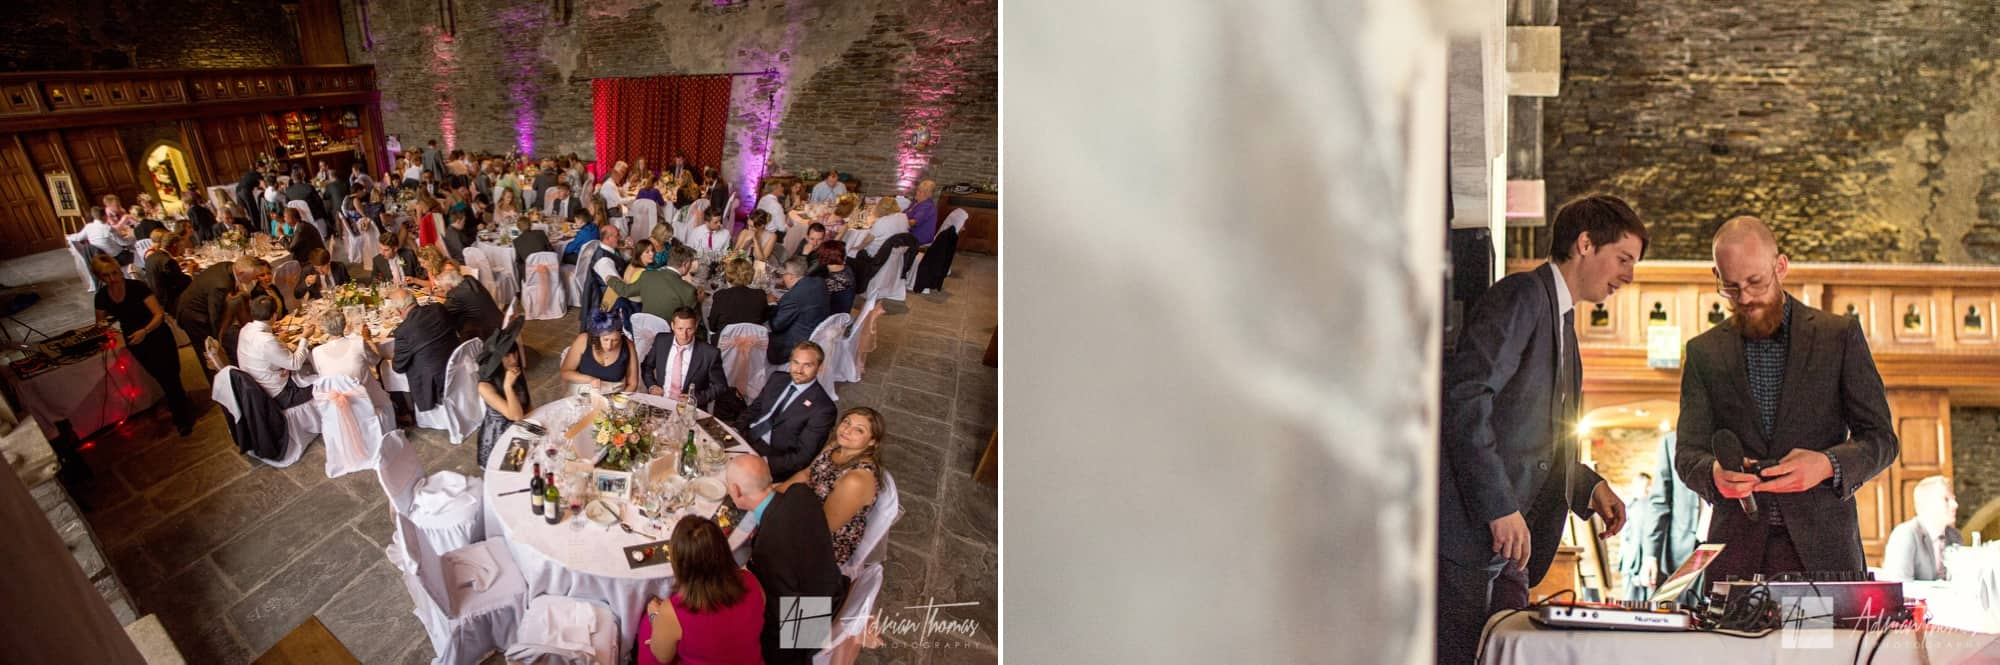 Castle wedding.